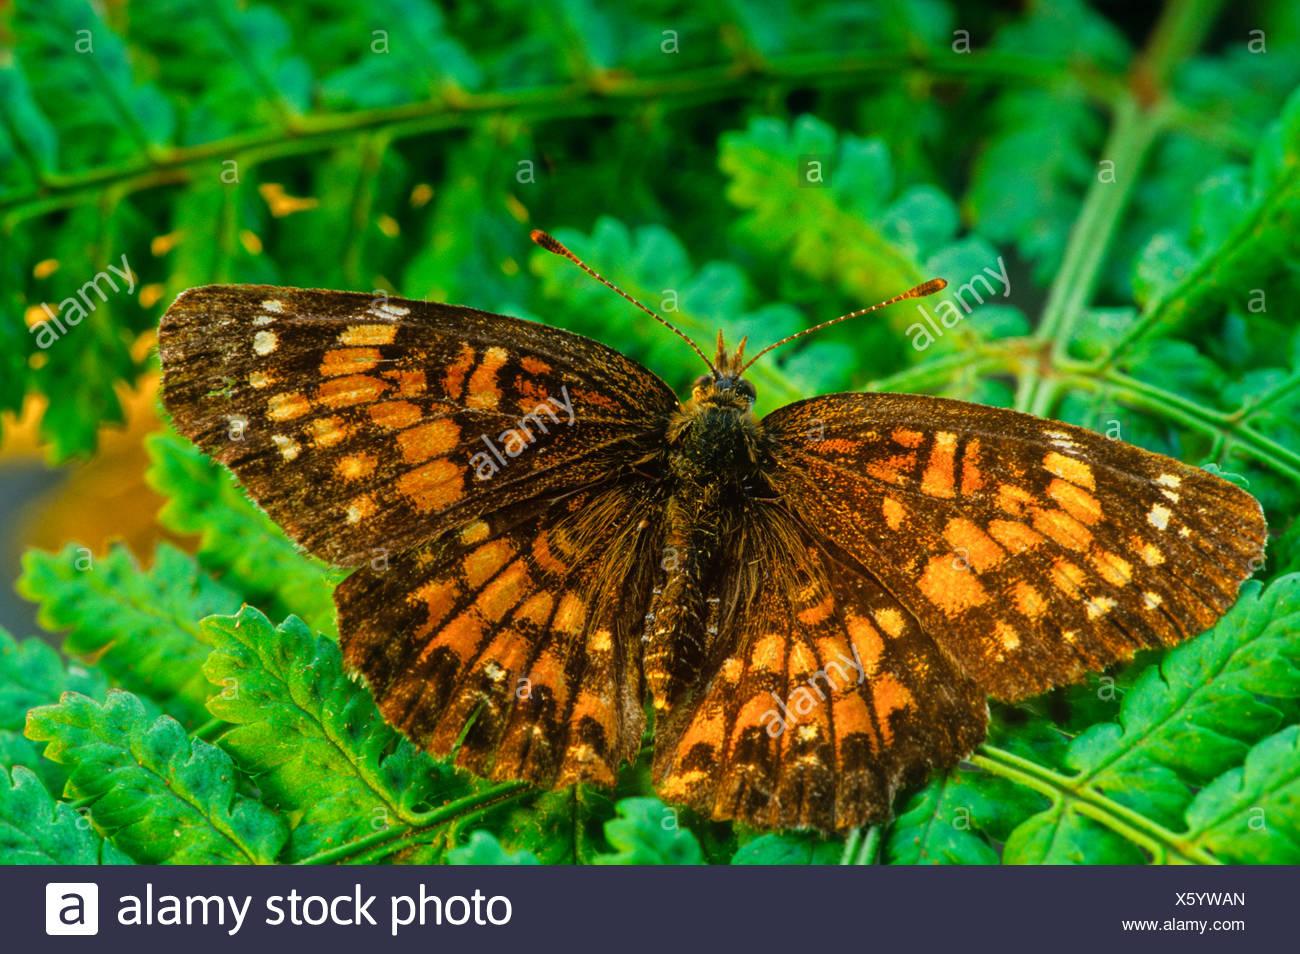 Harris' Checkerspot Butterfly, (Charidryas harrisii) - Stock Image